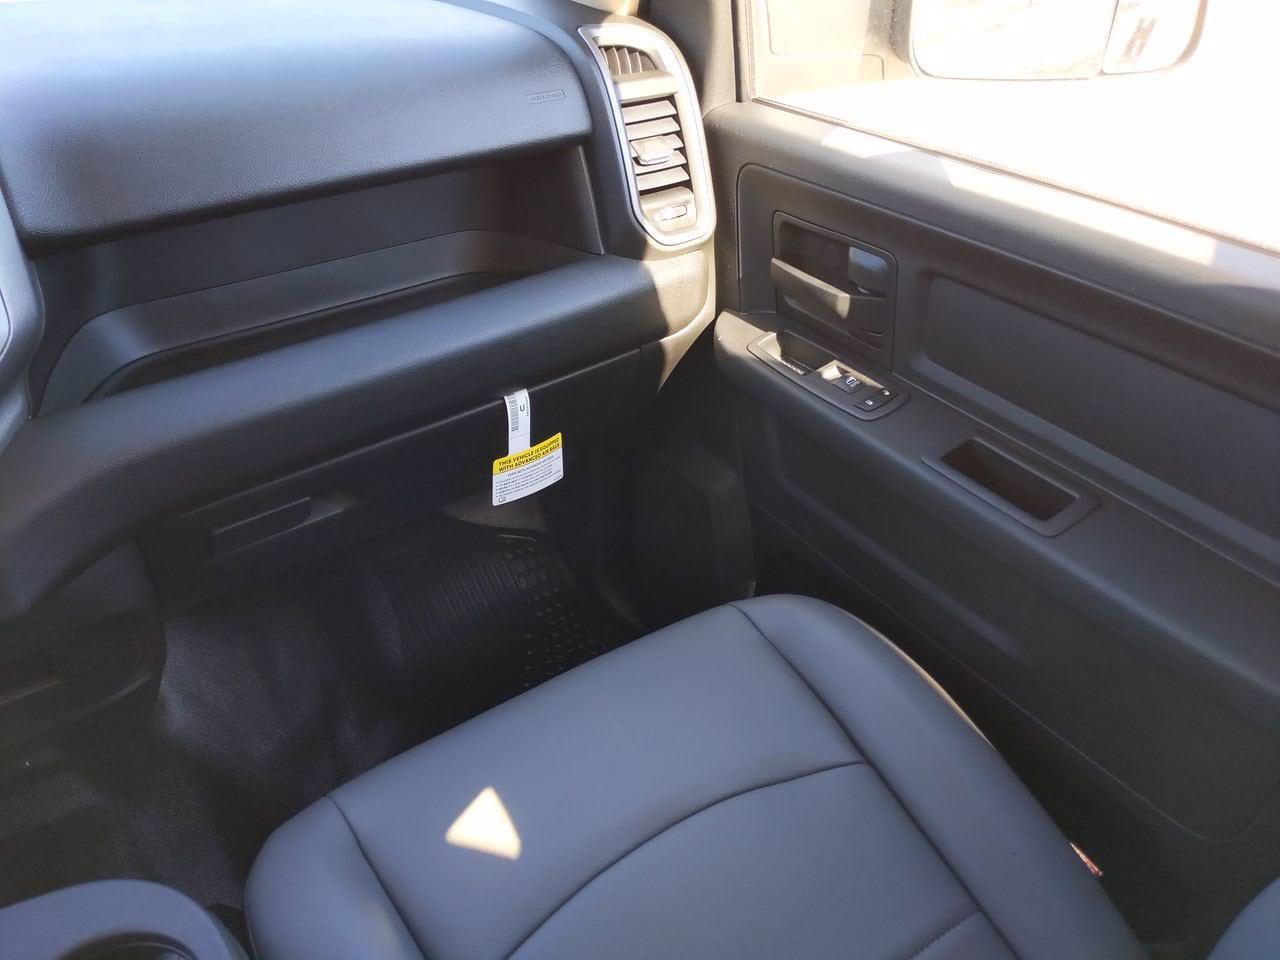 2020 Ram 5500 Crew Cab DRW 4x4, Cab Chassis #CL00174 - photo 27